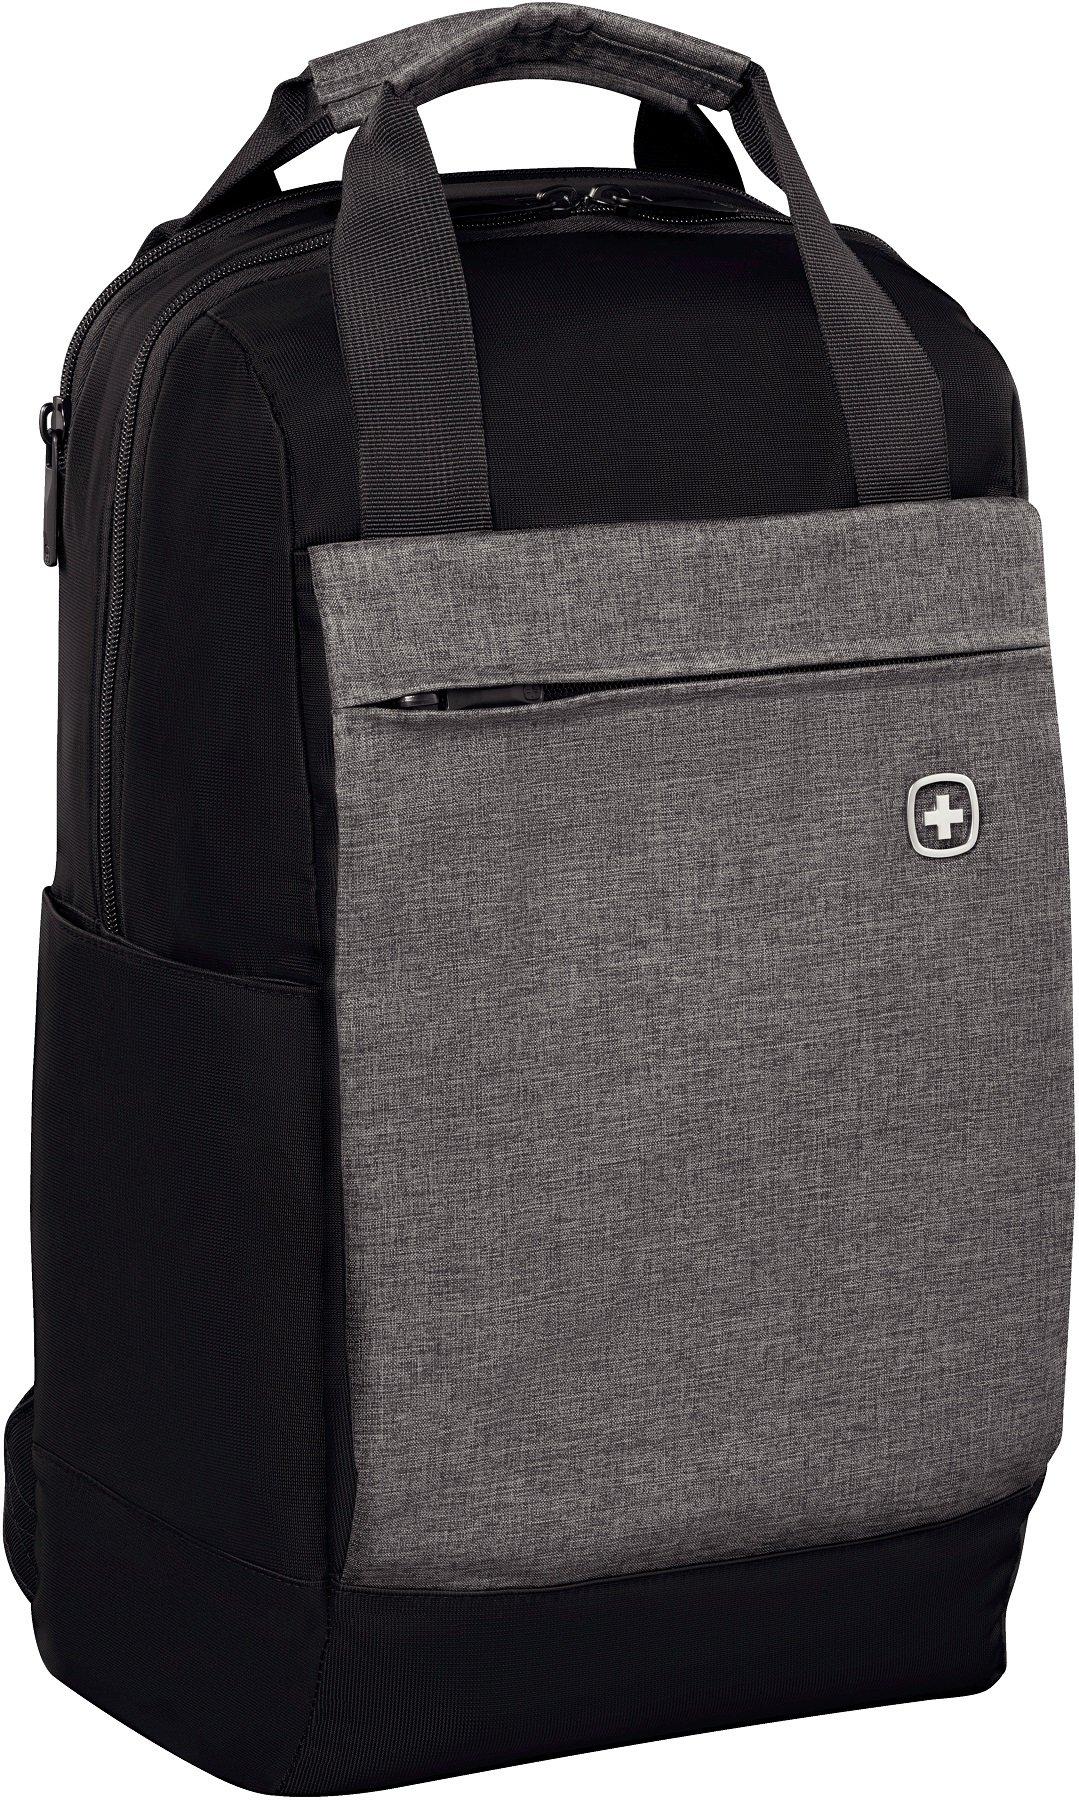 91BW0CLdITL - Wenger 601082 Bahn 35,56 cm Tablet Mochila con Bolsillo para Ordenador portátil - Negro